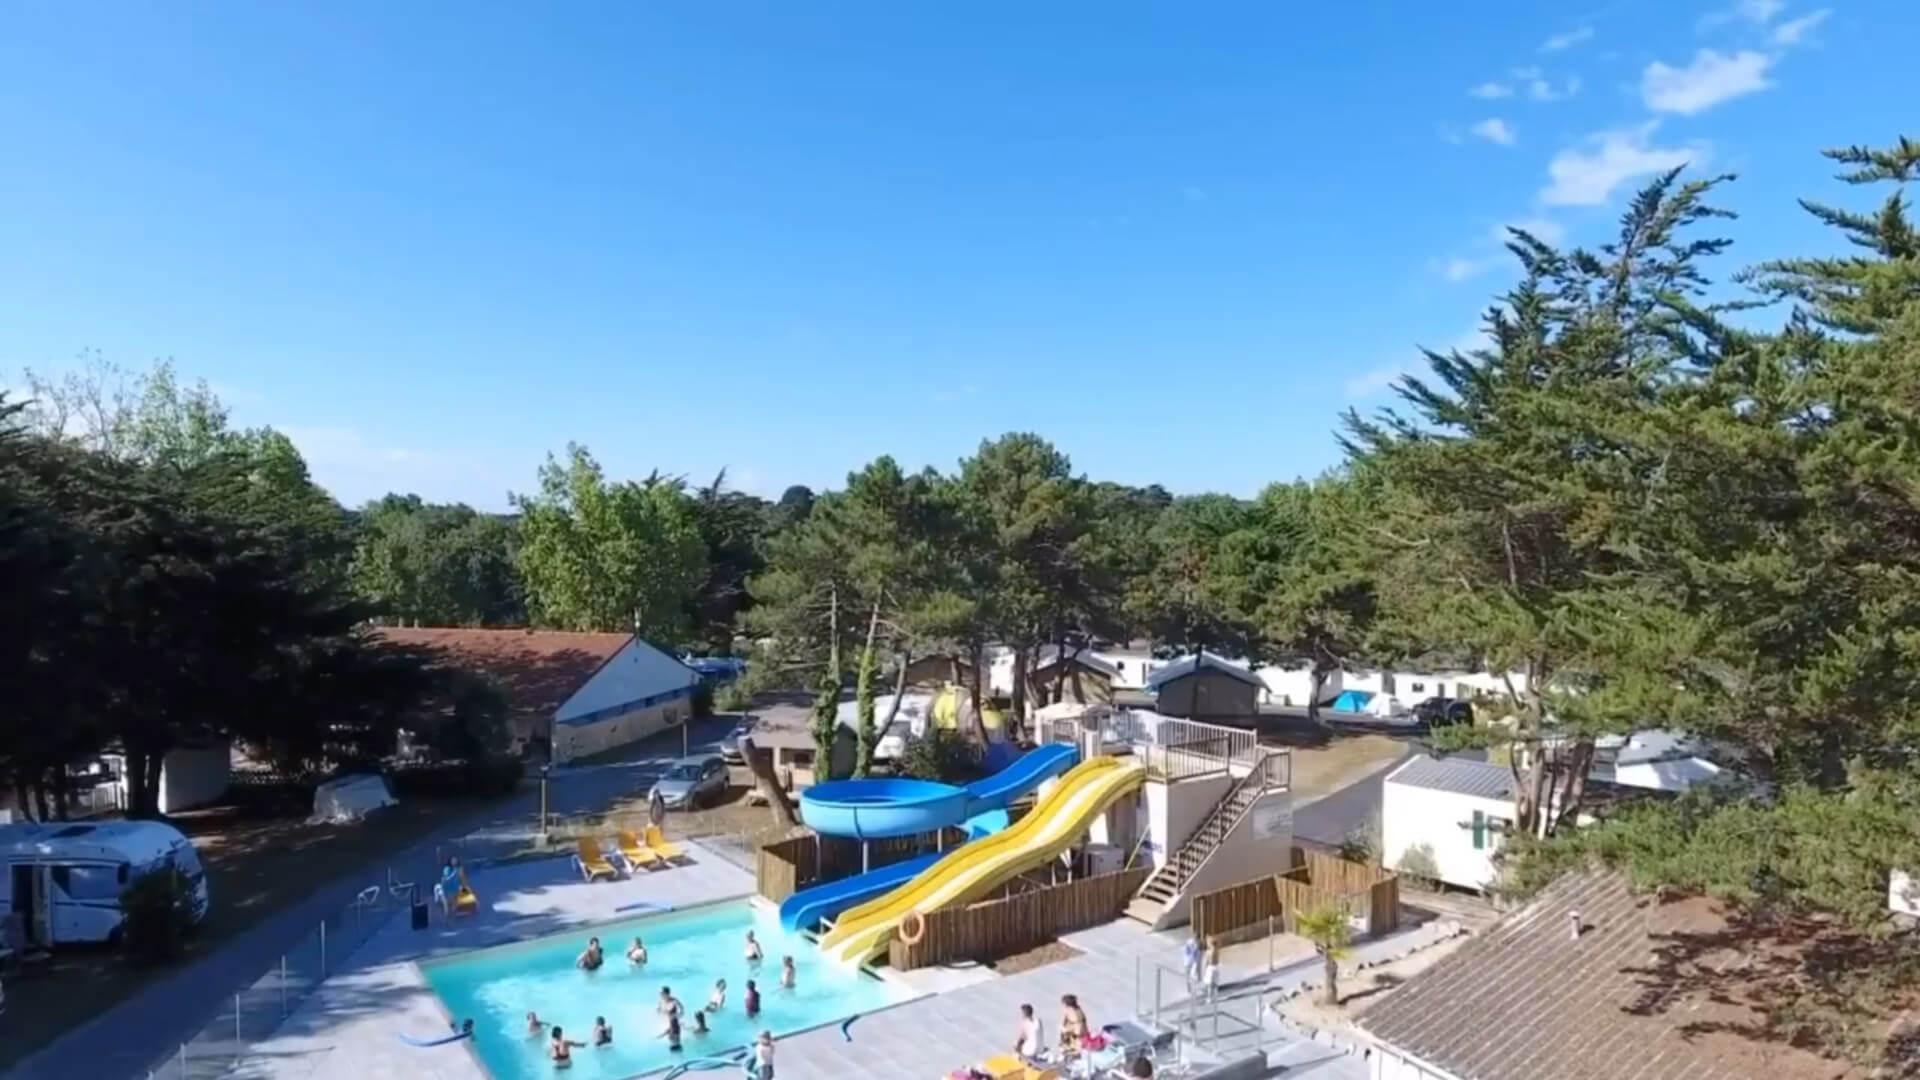 Camping Clos Mer Et Nature Slide Thumb 00